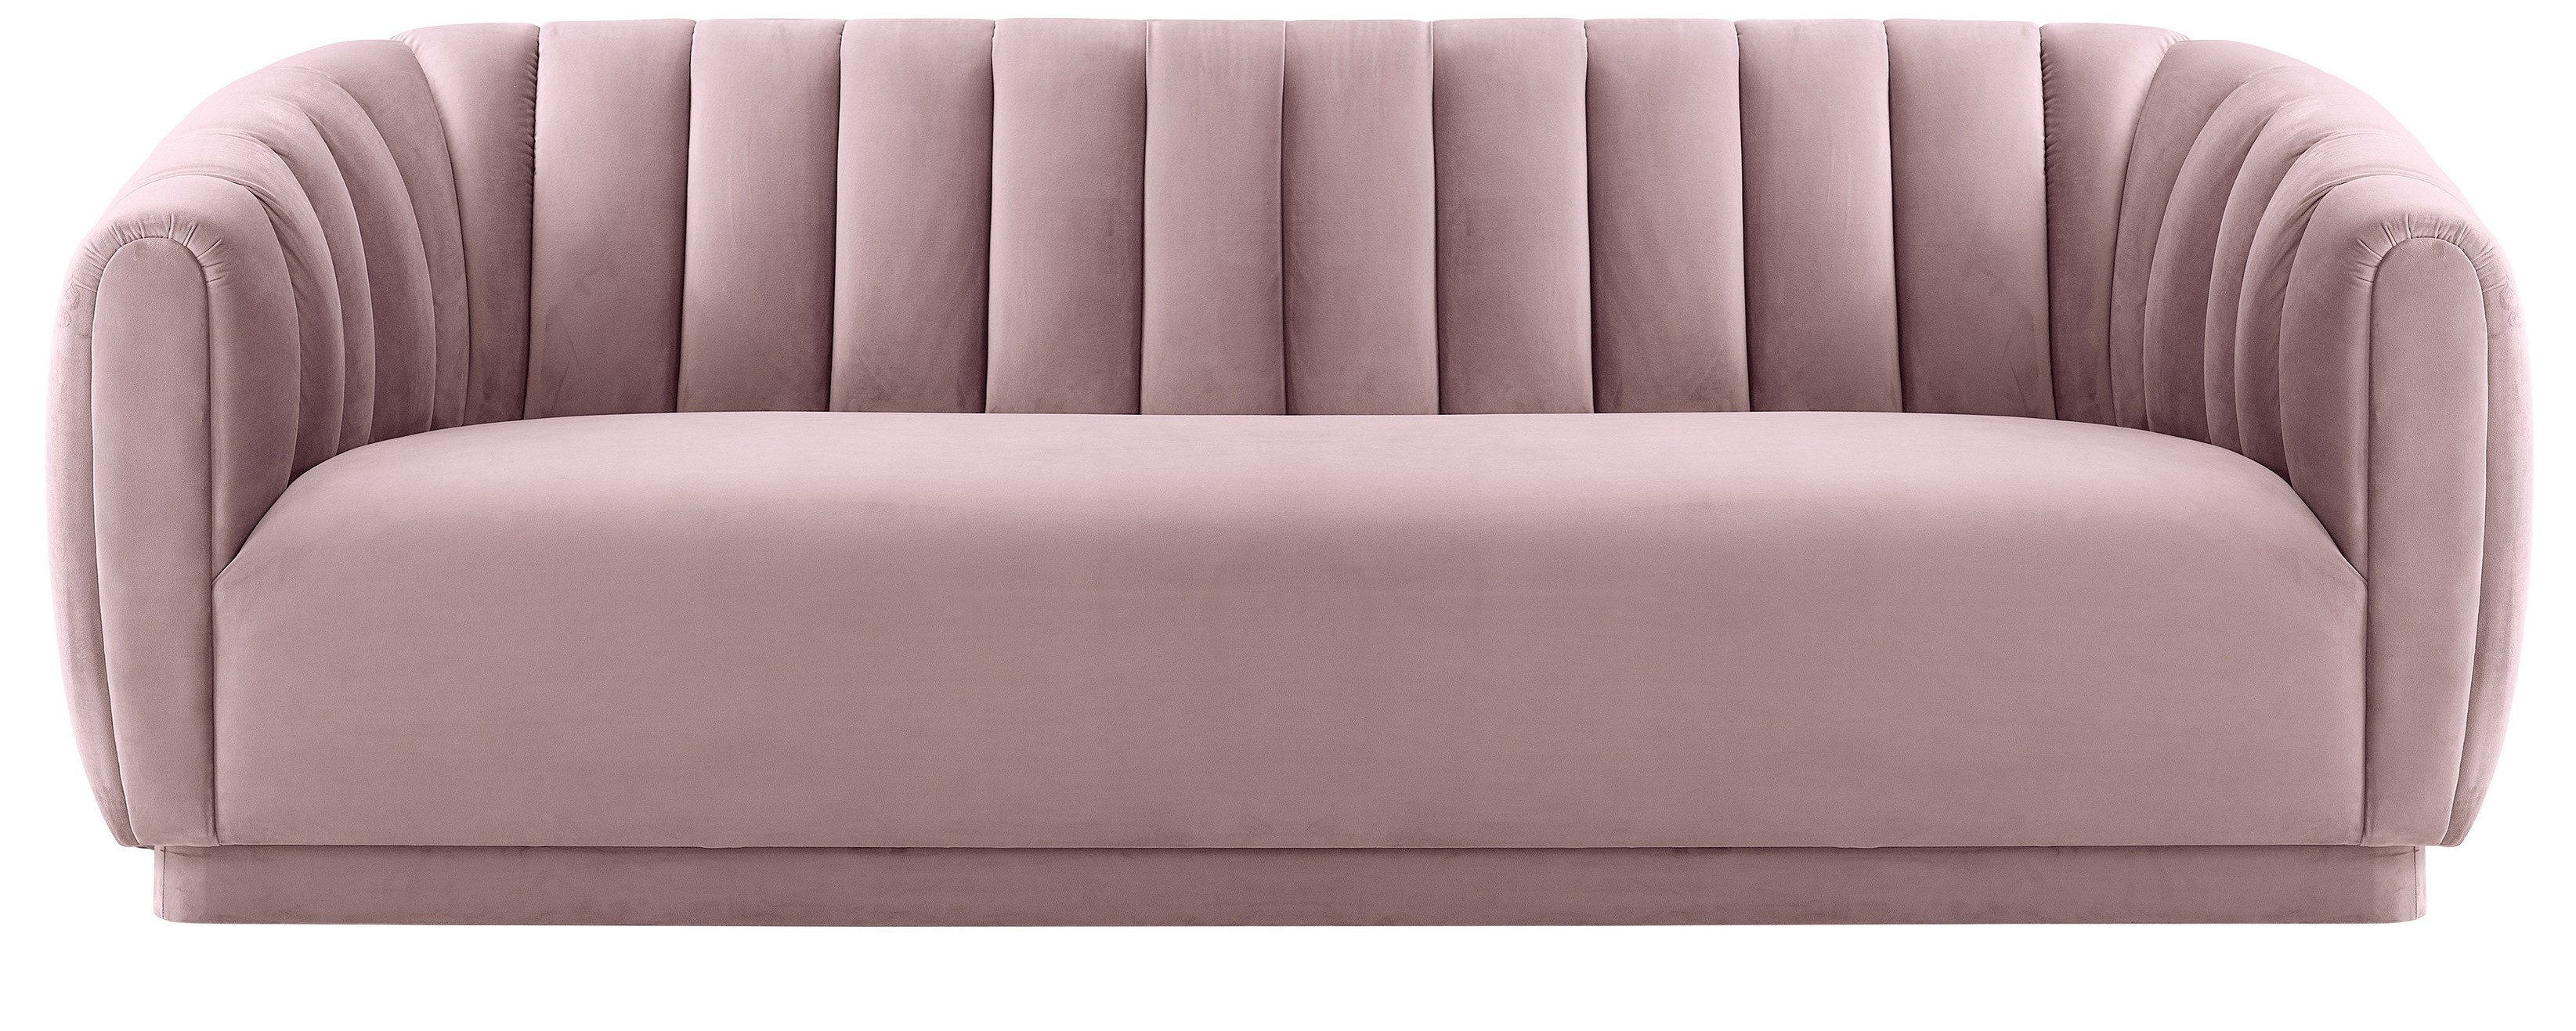 Marissa Velvet Sofa, Blush – Velvet – Trends – Furniture Within Marissa Ii 3 Piece Sectionals (Image 11 of 25)